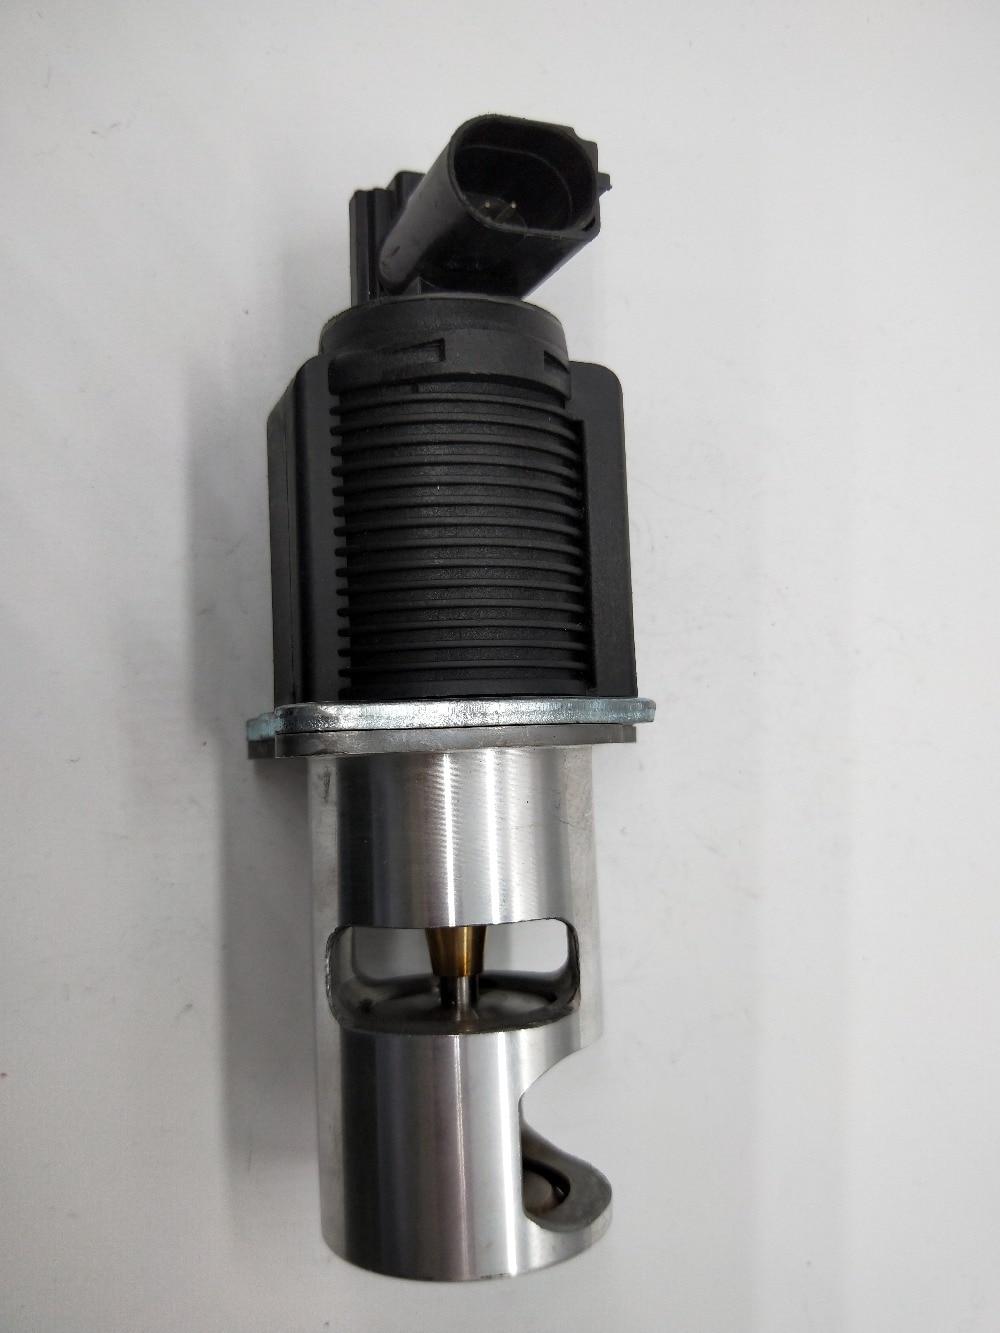 aliexpress com : buy egr valve for dacia logan sandero nissan kubistar  micra suzuki jimny renault clio grand scenic kangoo megane modus thalia 1 5  from